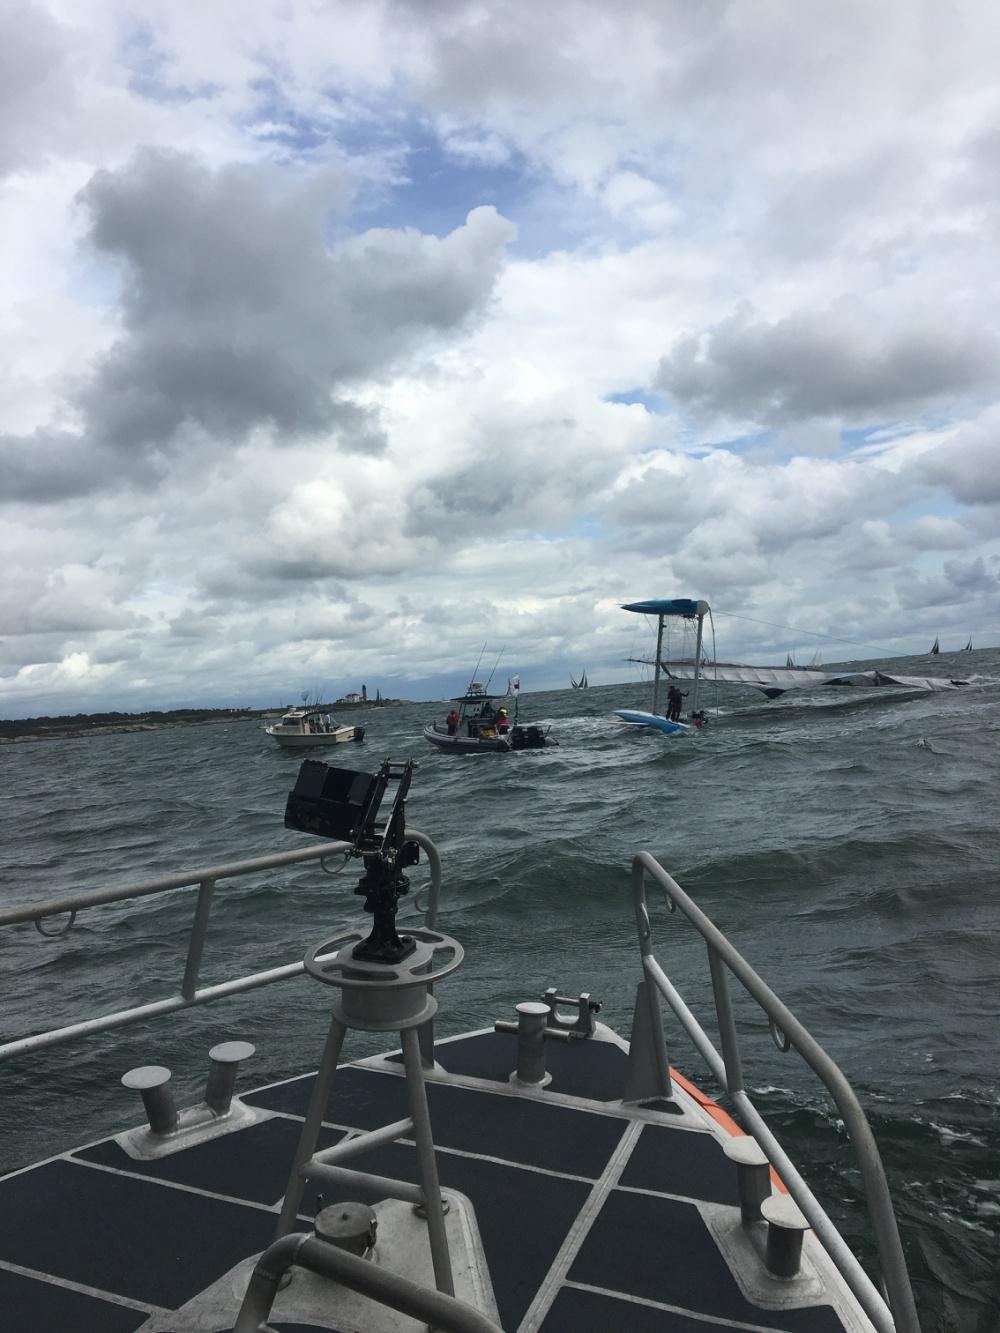 The Coast Guard arrives on the scene. Photo USCG.